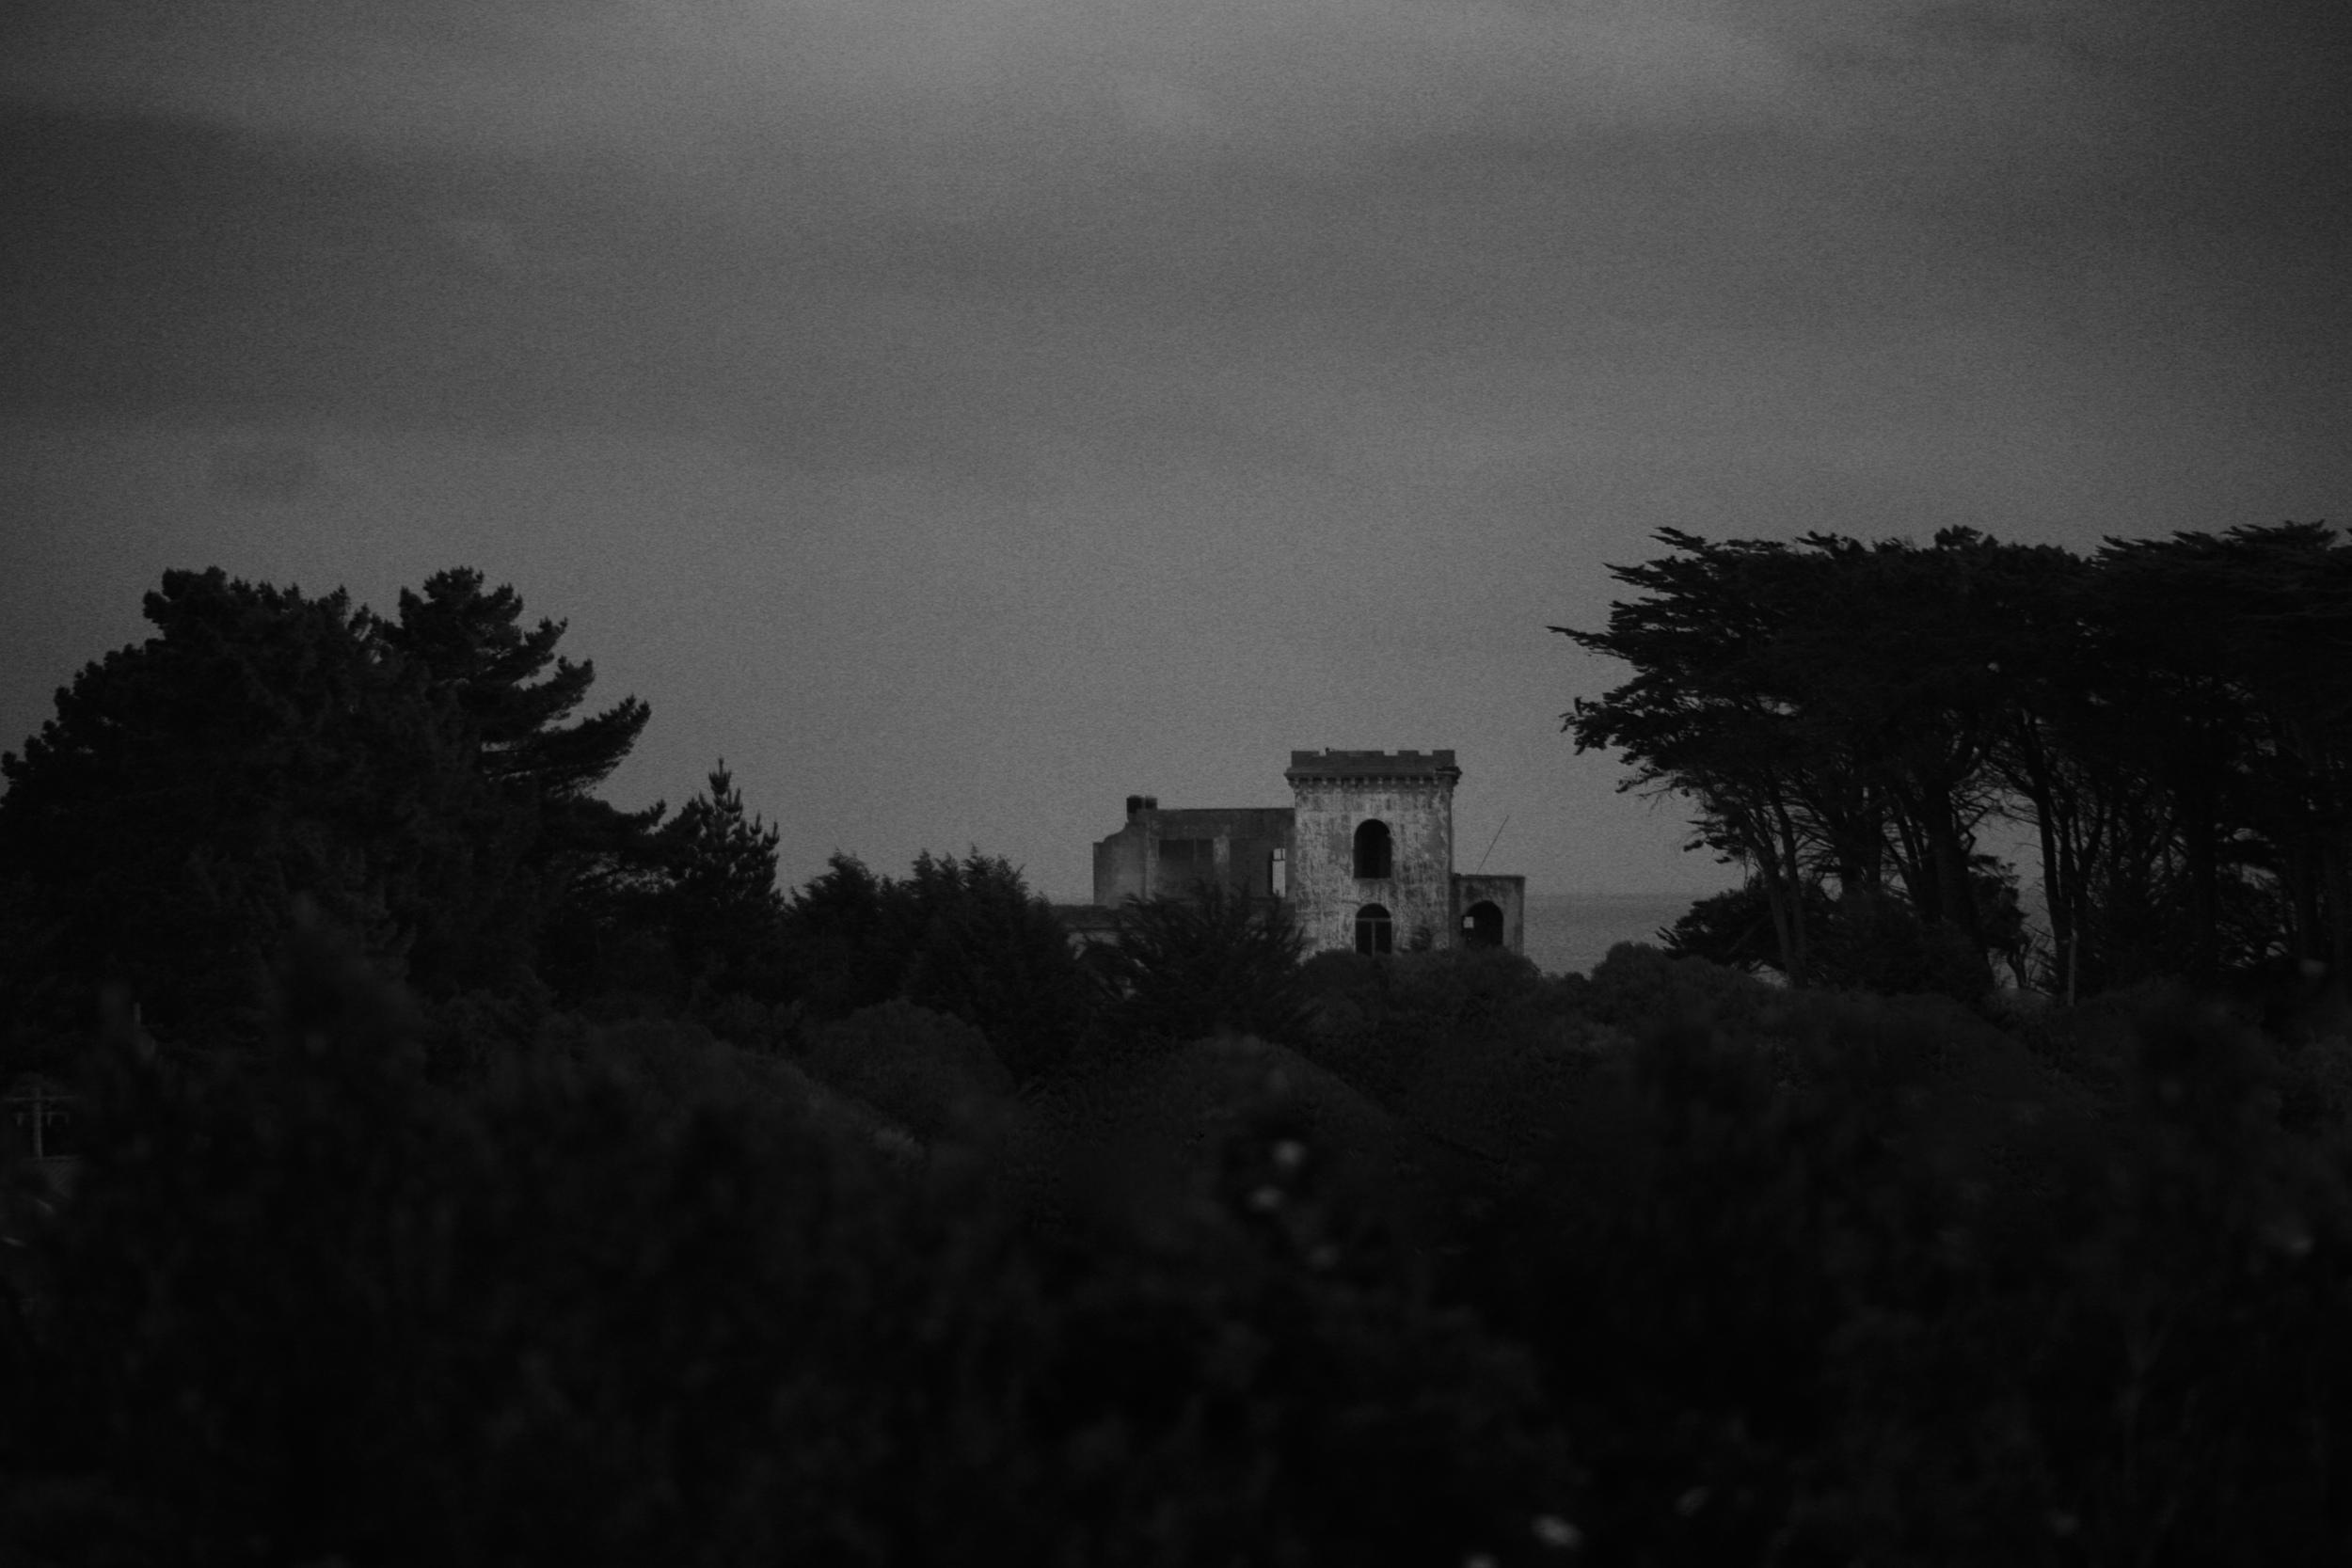 Cargill's Castle - an abandoned castle, Dunedin NZ.